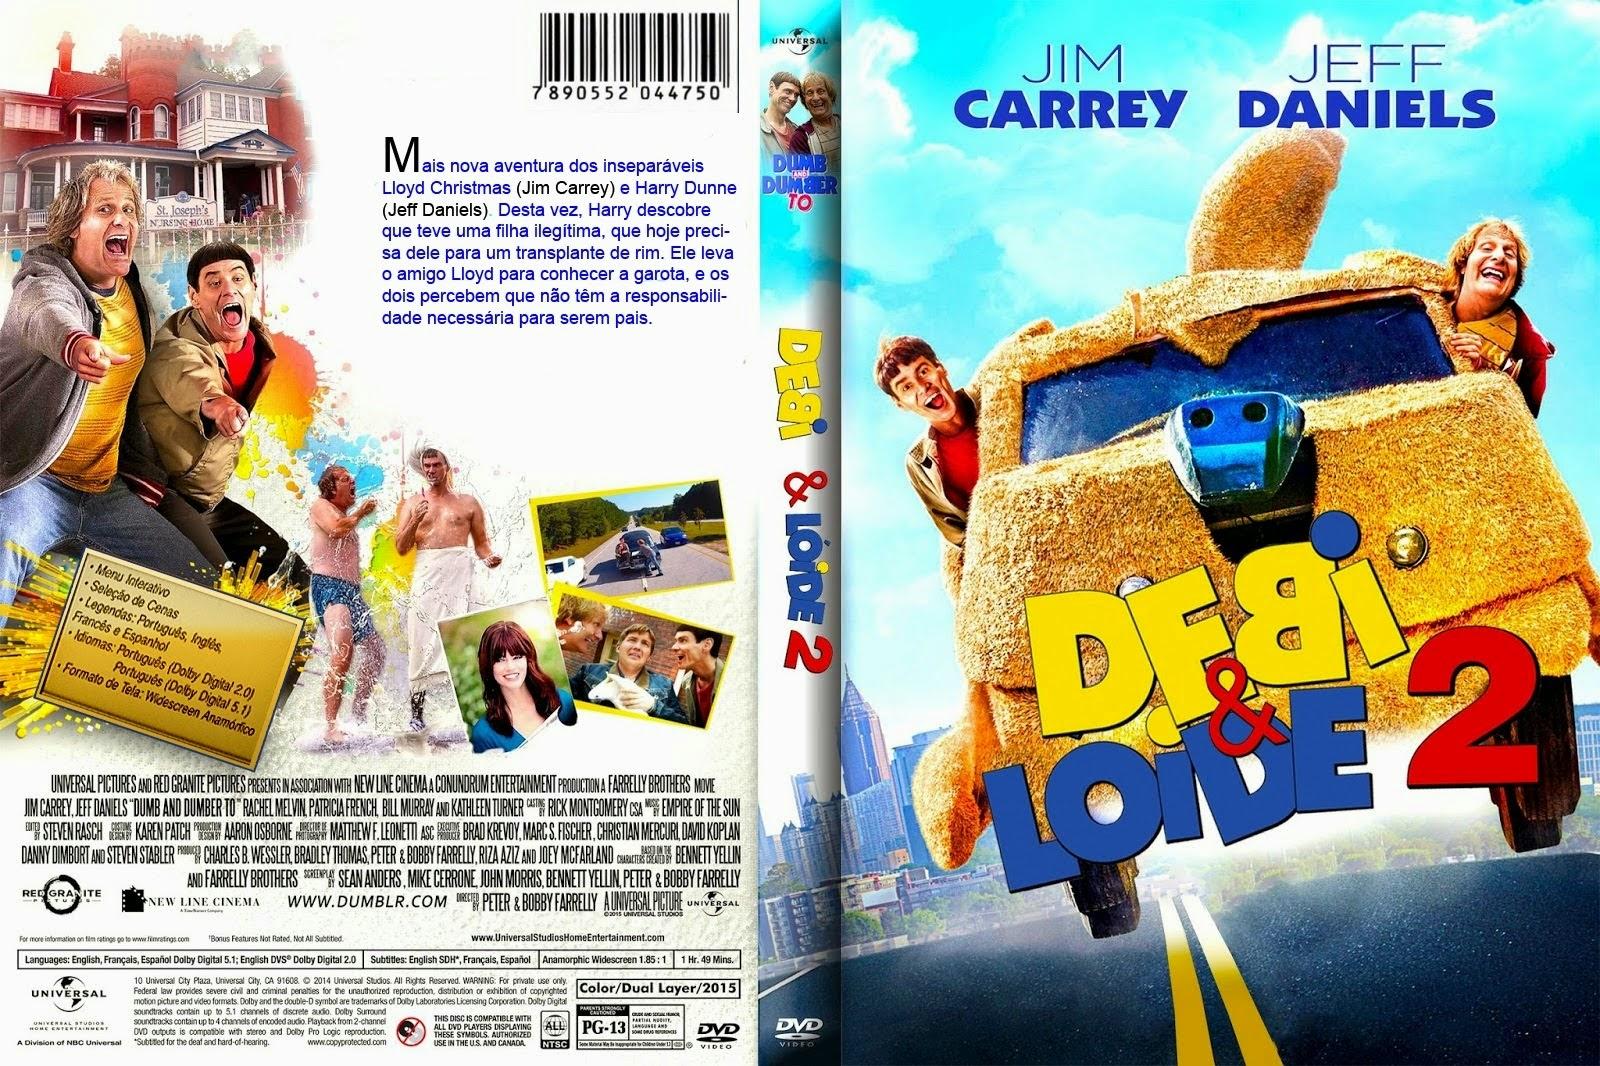 Debi loide 1 completo dublado online dating. Debi loide 1 completo dublado online dating.